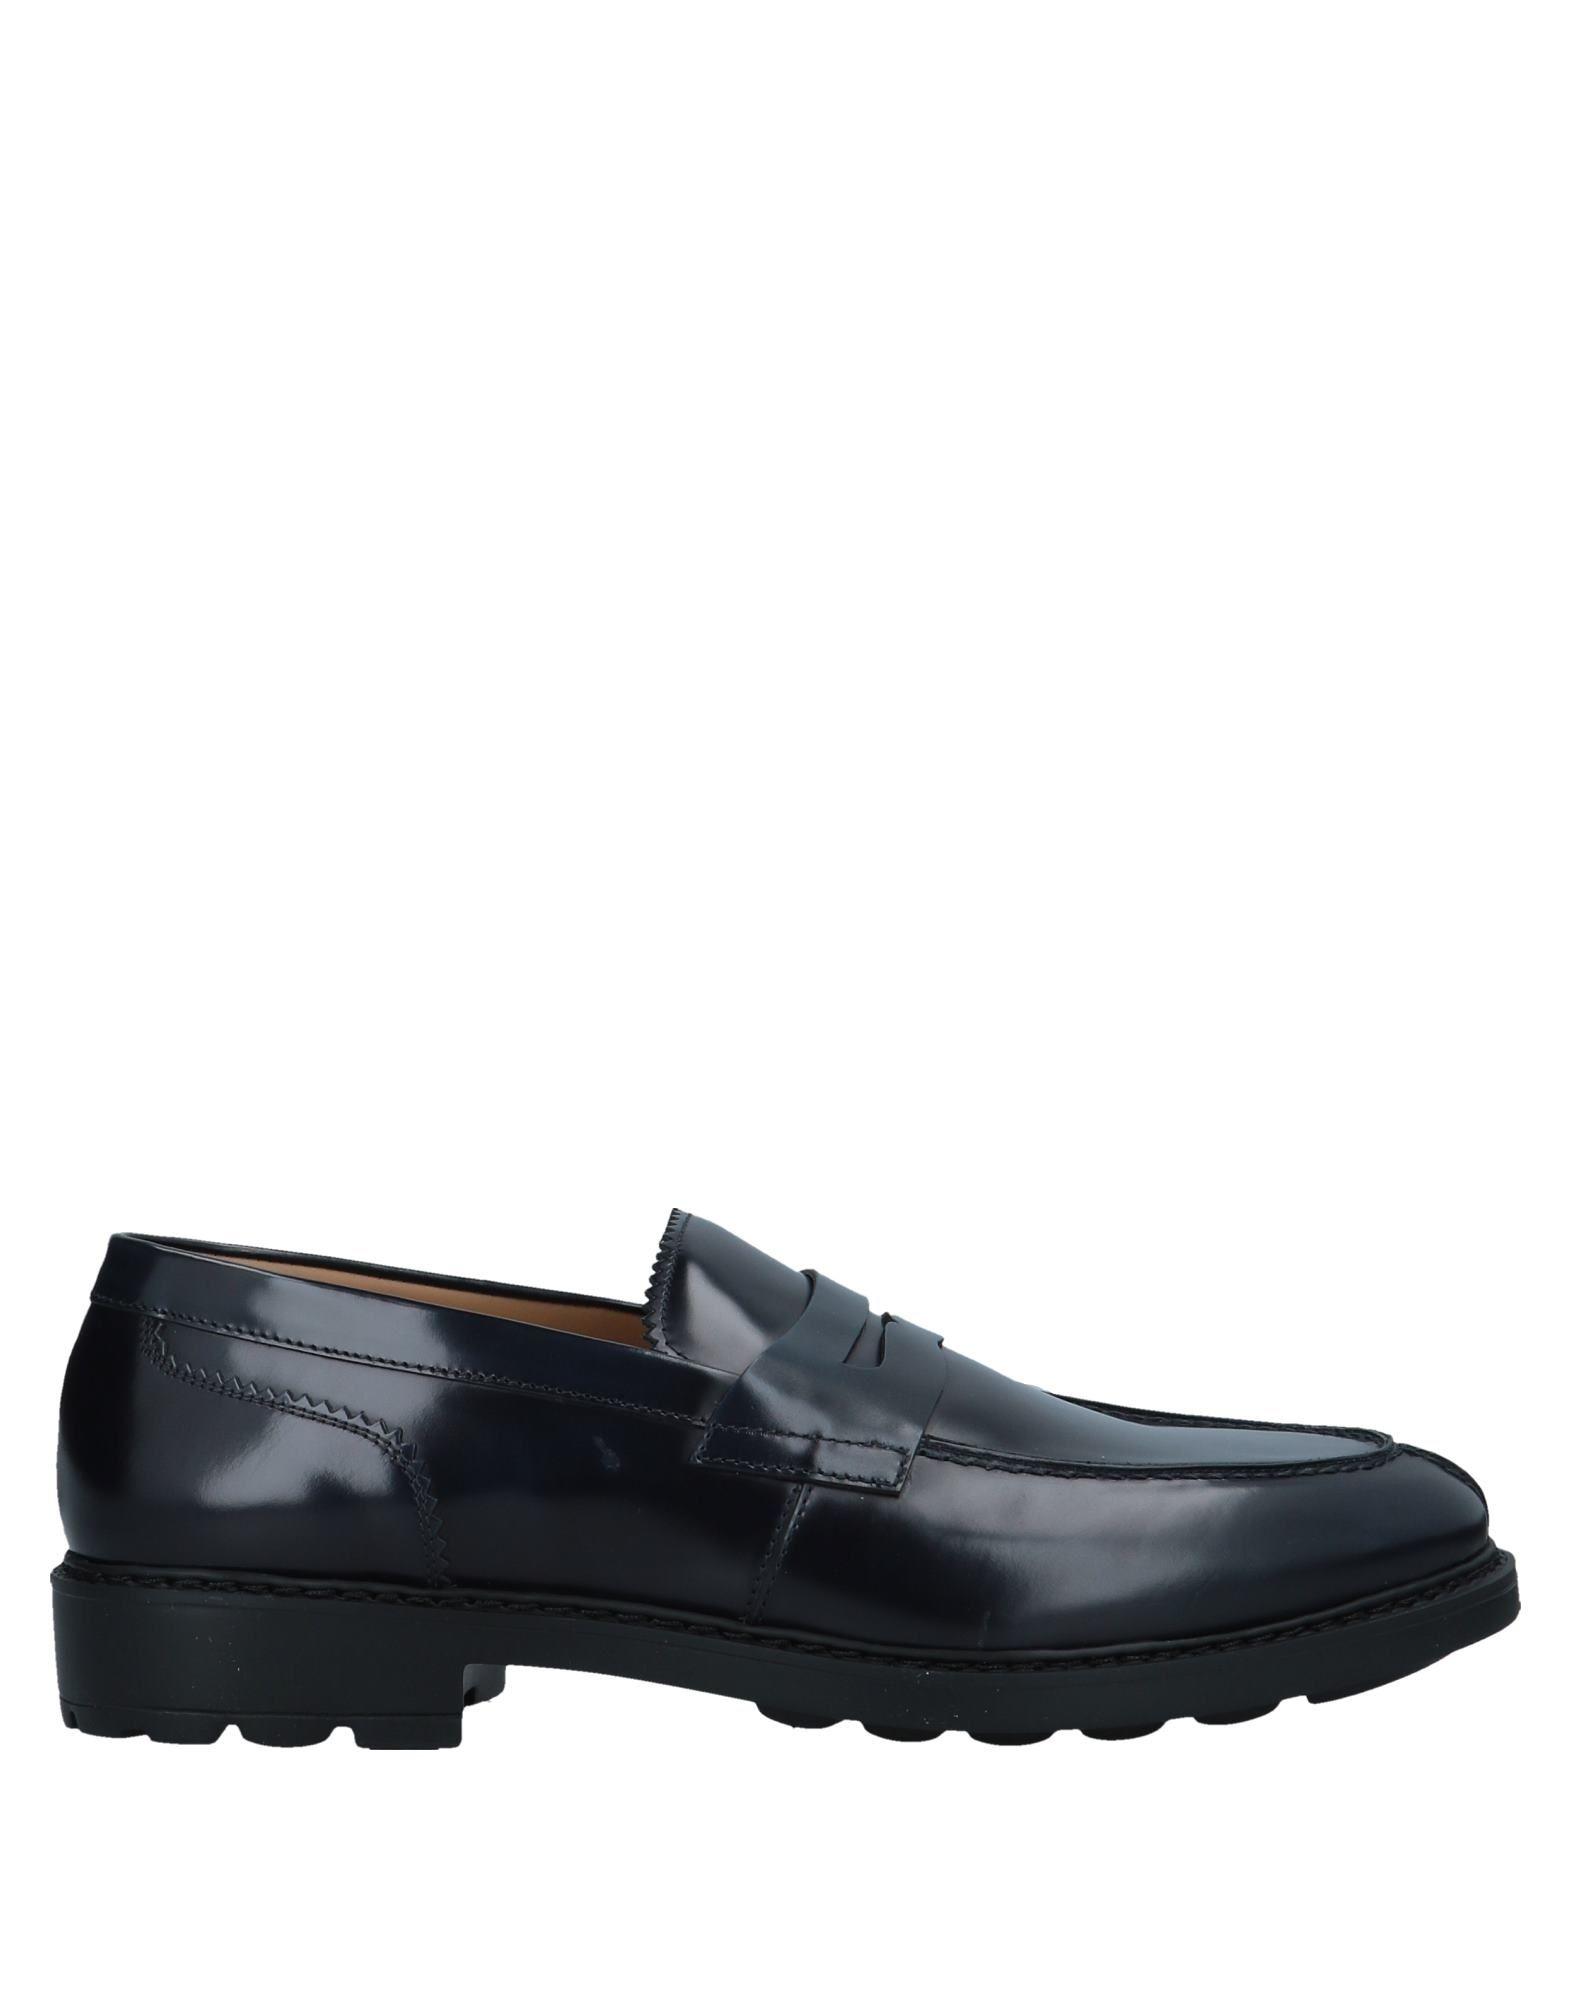 Rabatt echte Schuhe Triver Flight Mokassins Herren  11556975EX